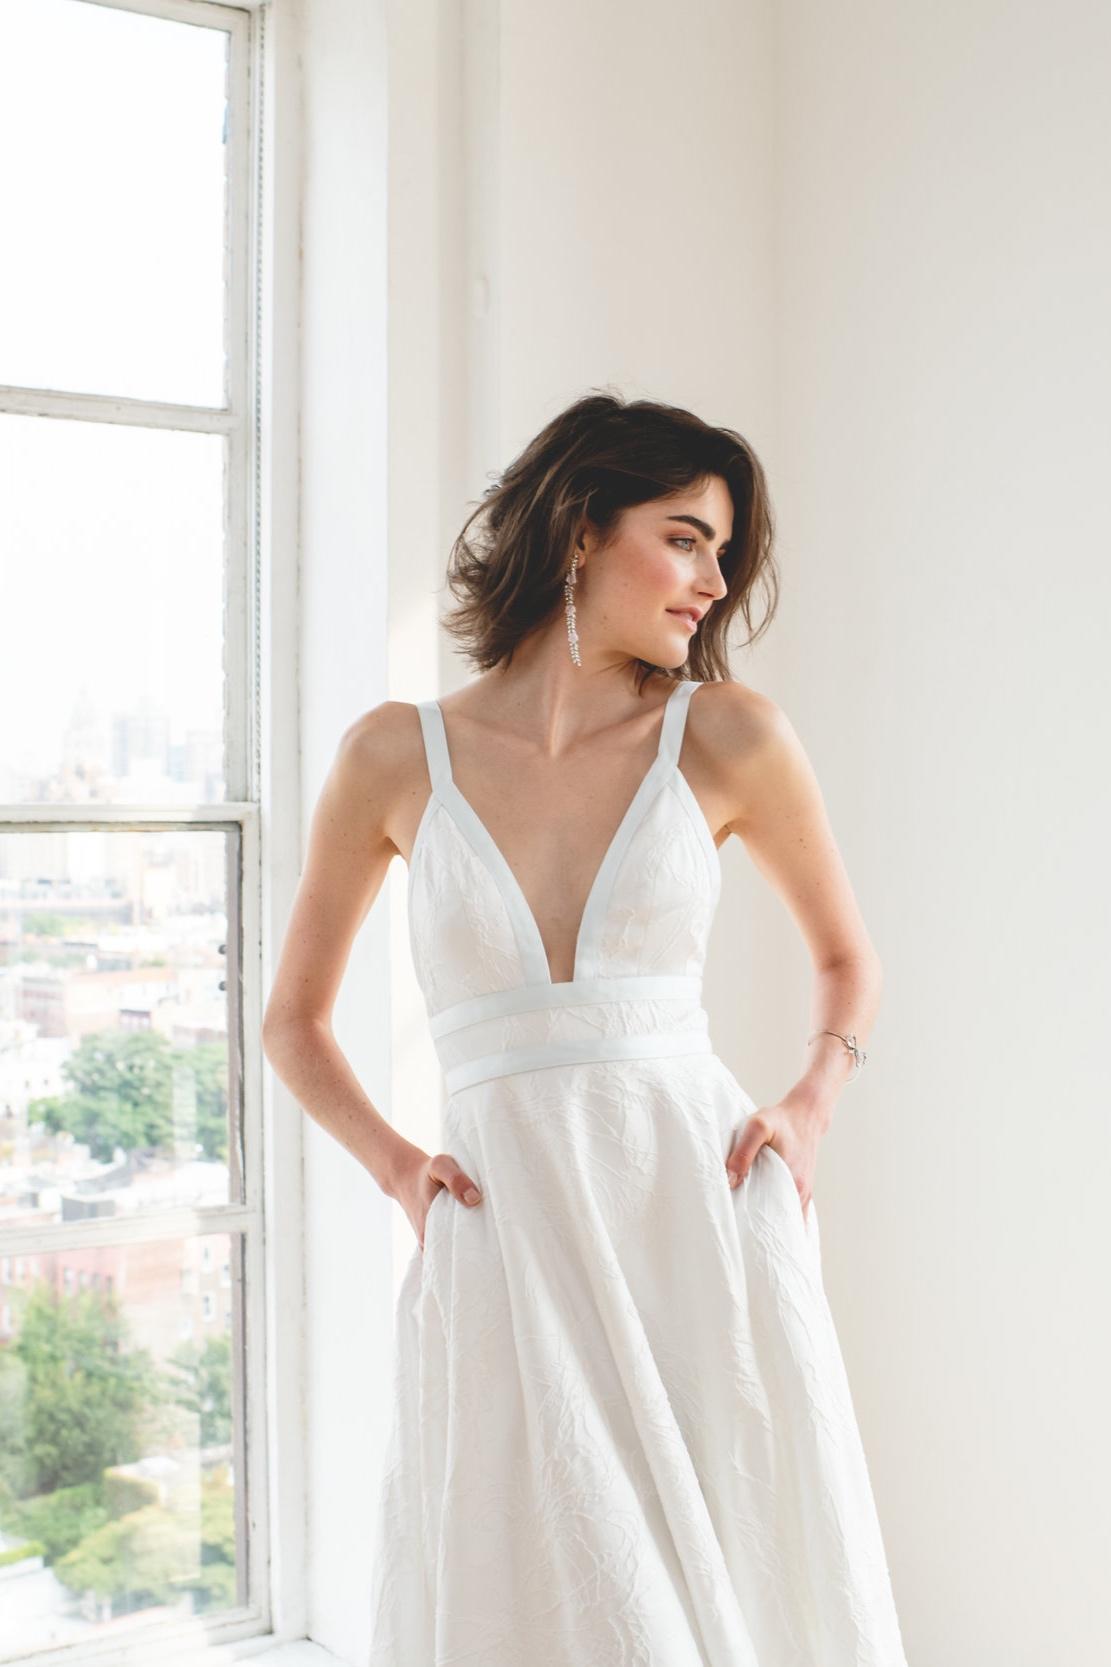 Ines by Ines Di Santo Bridal Fall 2019   MARINA    INQUIRE